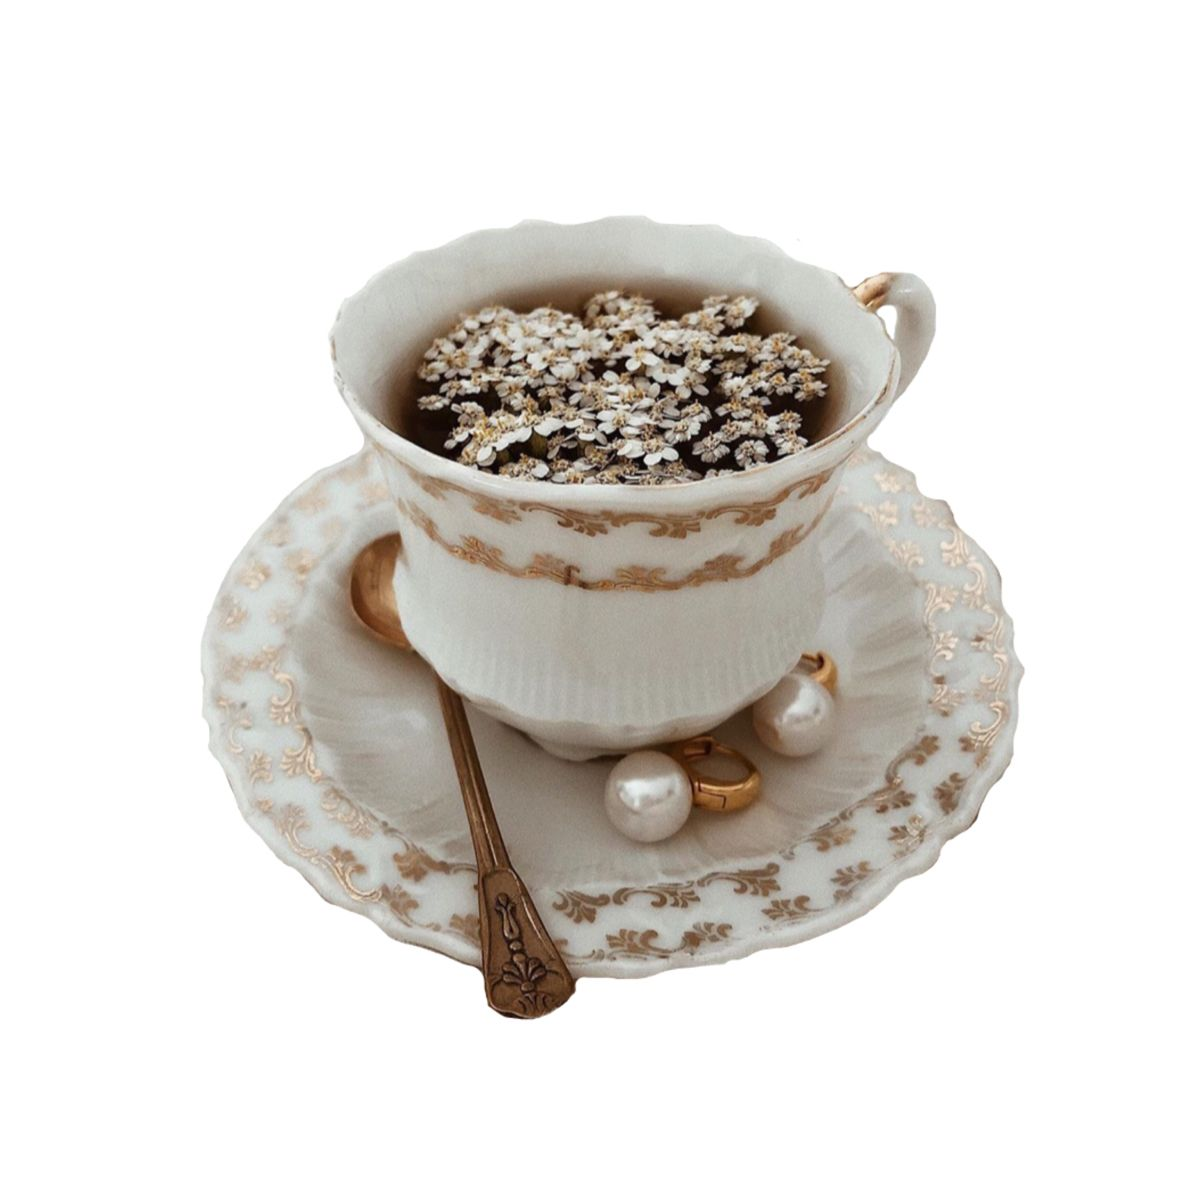 Png Polyvore Pngpolyvore White Rose Gold Flower Tea Cup Png Polyvore Food Png White Rose Png Flower Tea